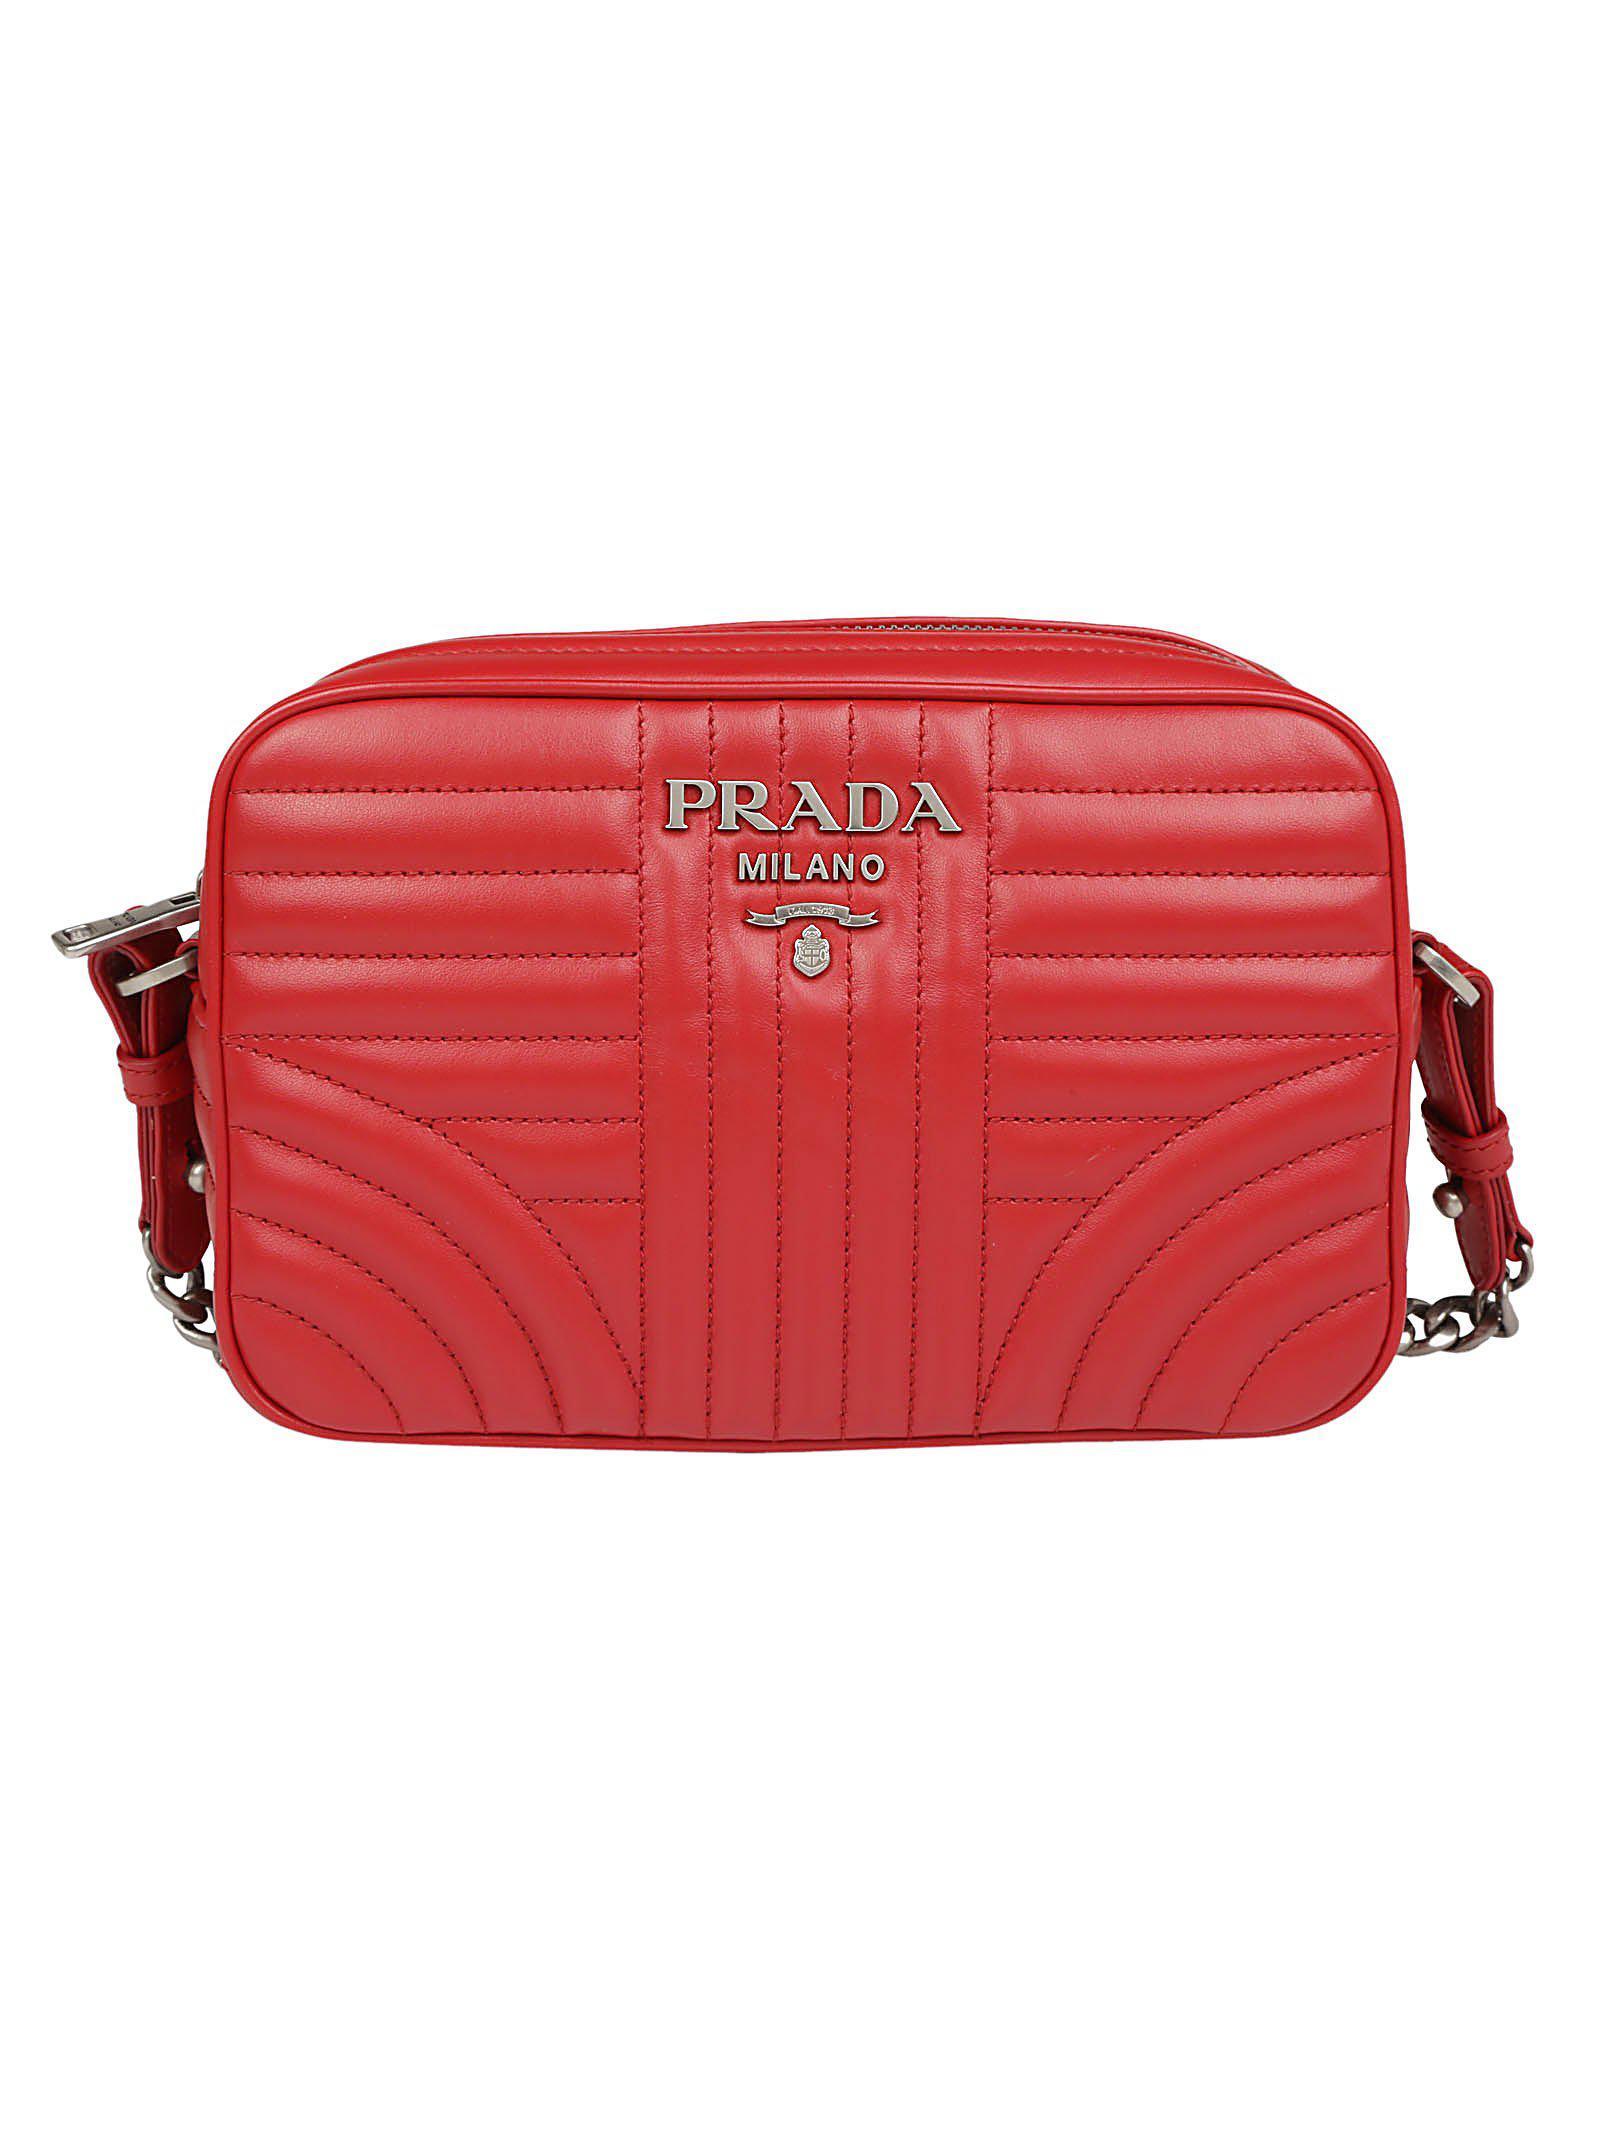 7b712acf8fa1 Prada Bevelled Shoulder Bag in Red - Lyst